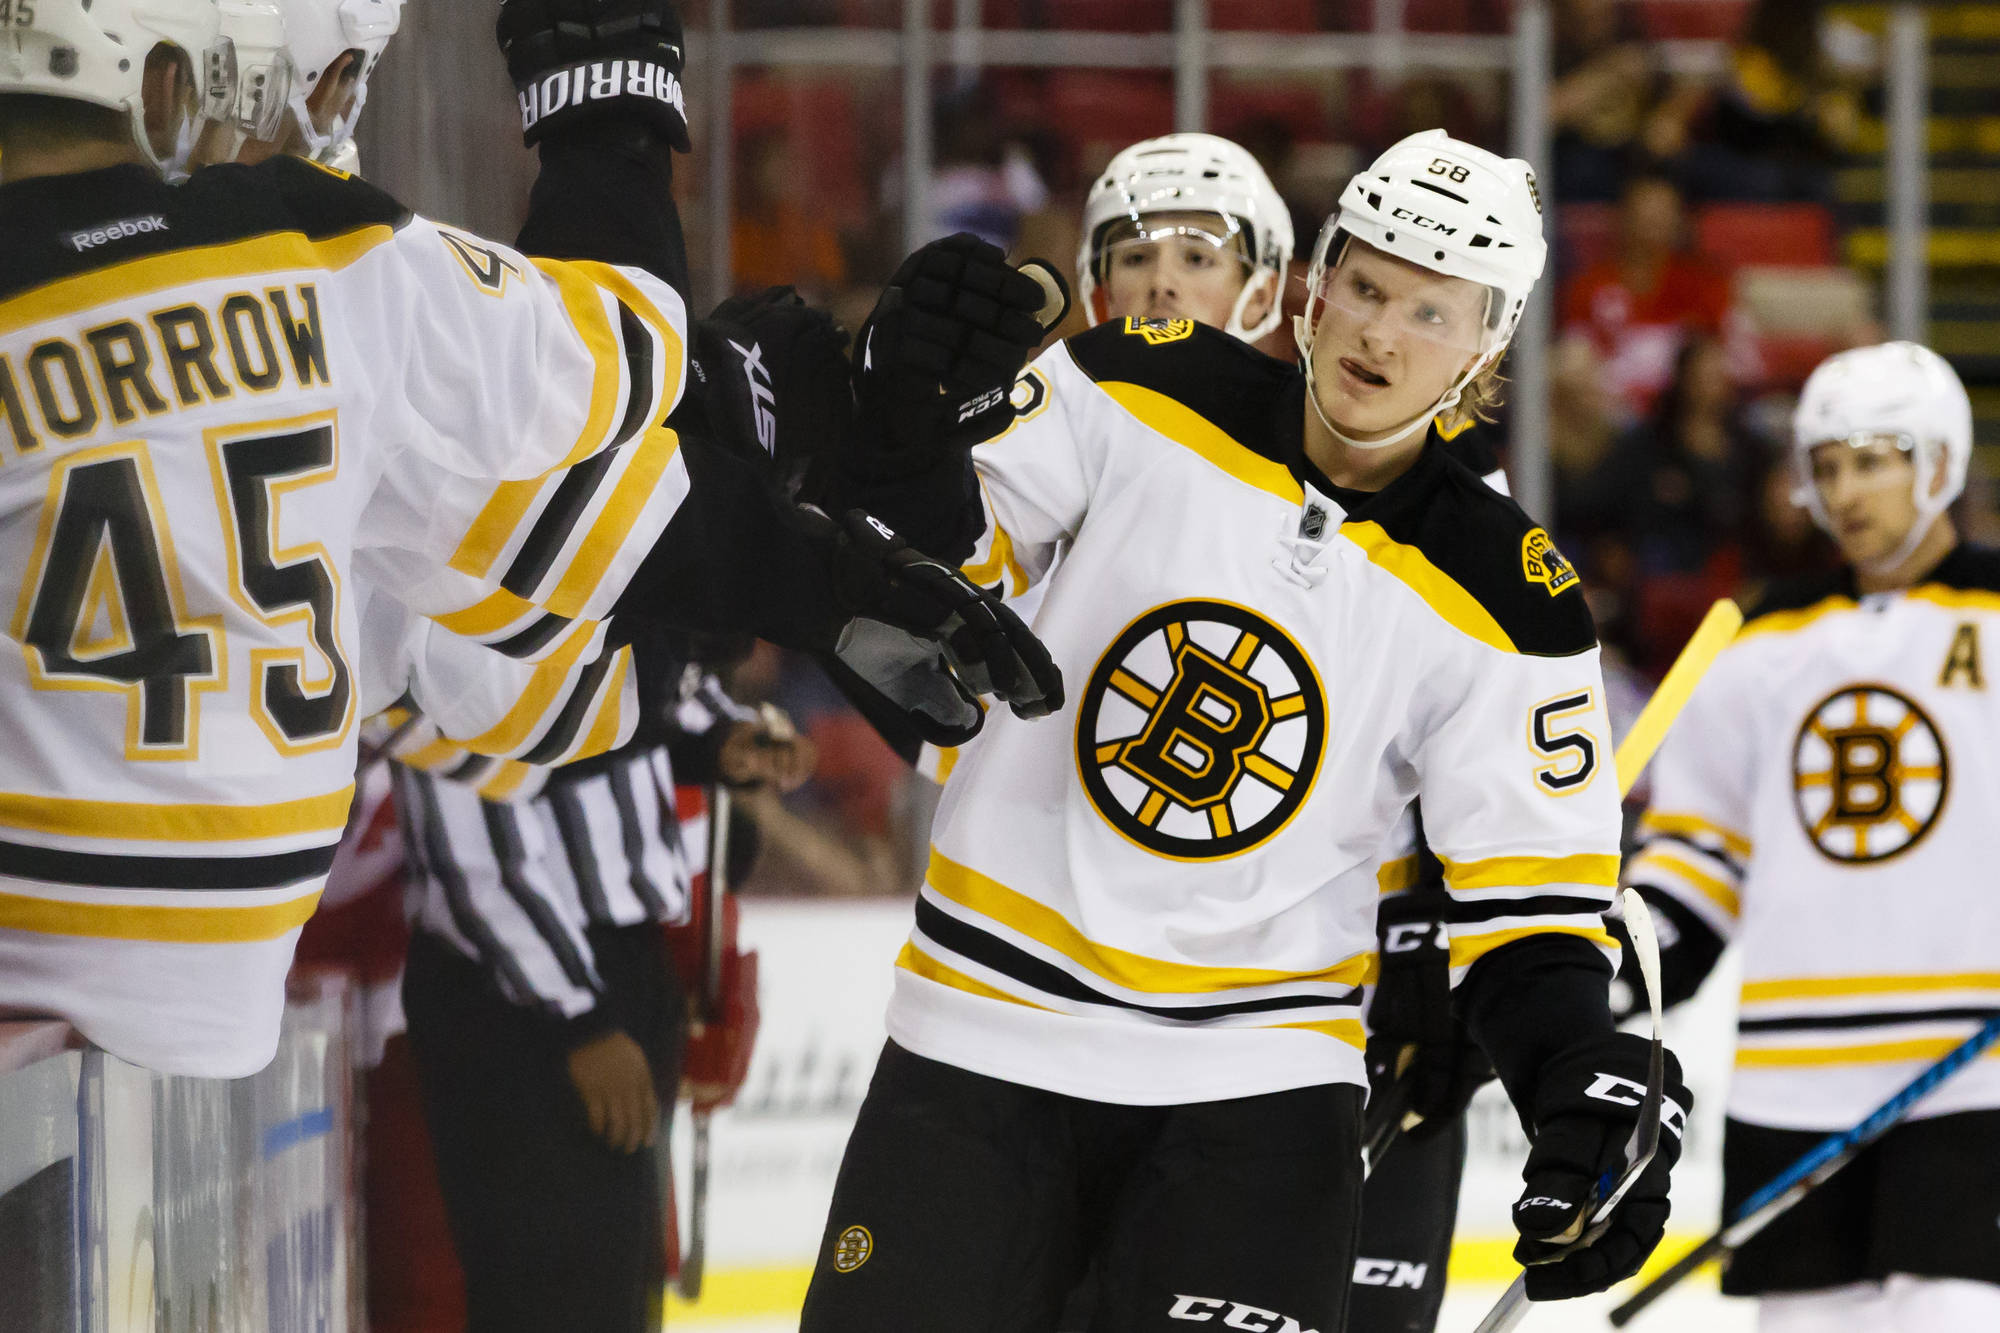 Danton Heinen Should Make the Boston Bruins